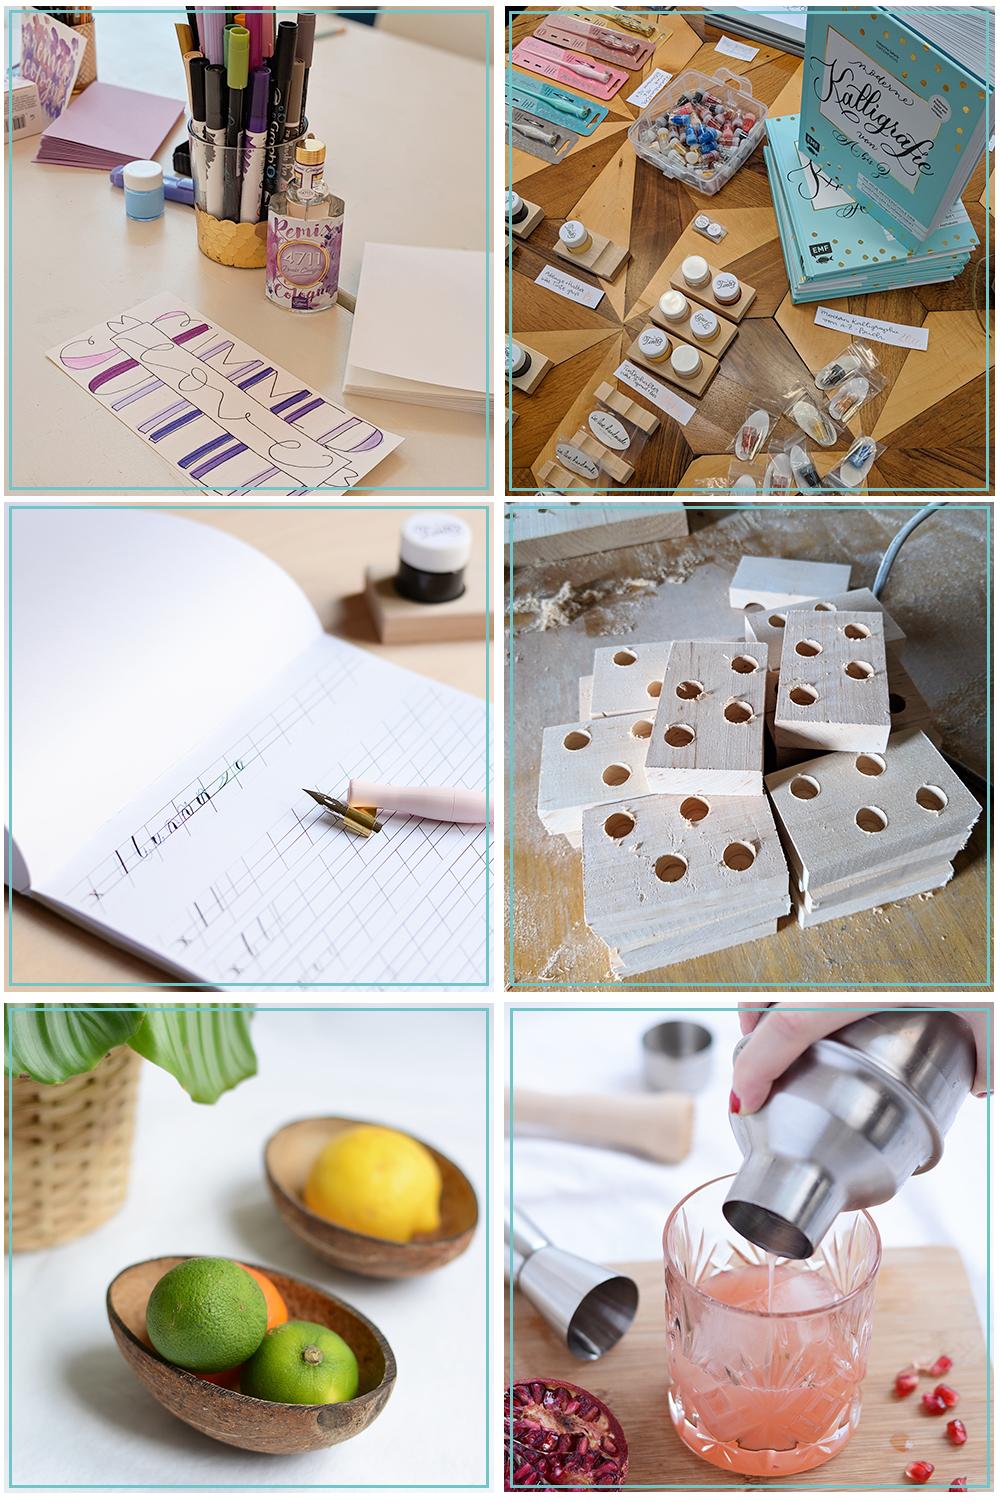 Monatsrückblick März 2019 | we love handmade